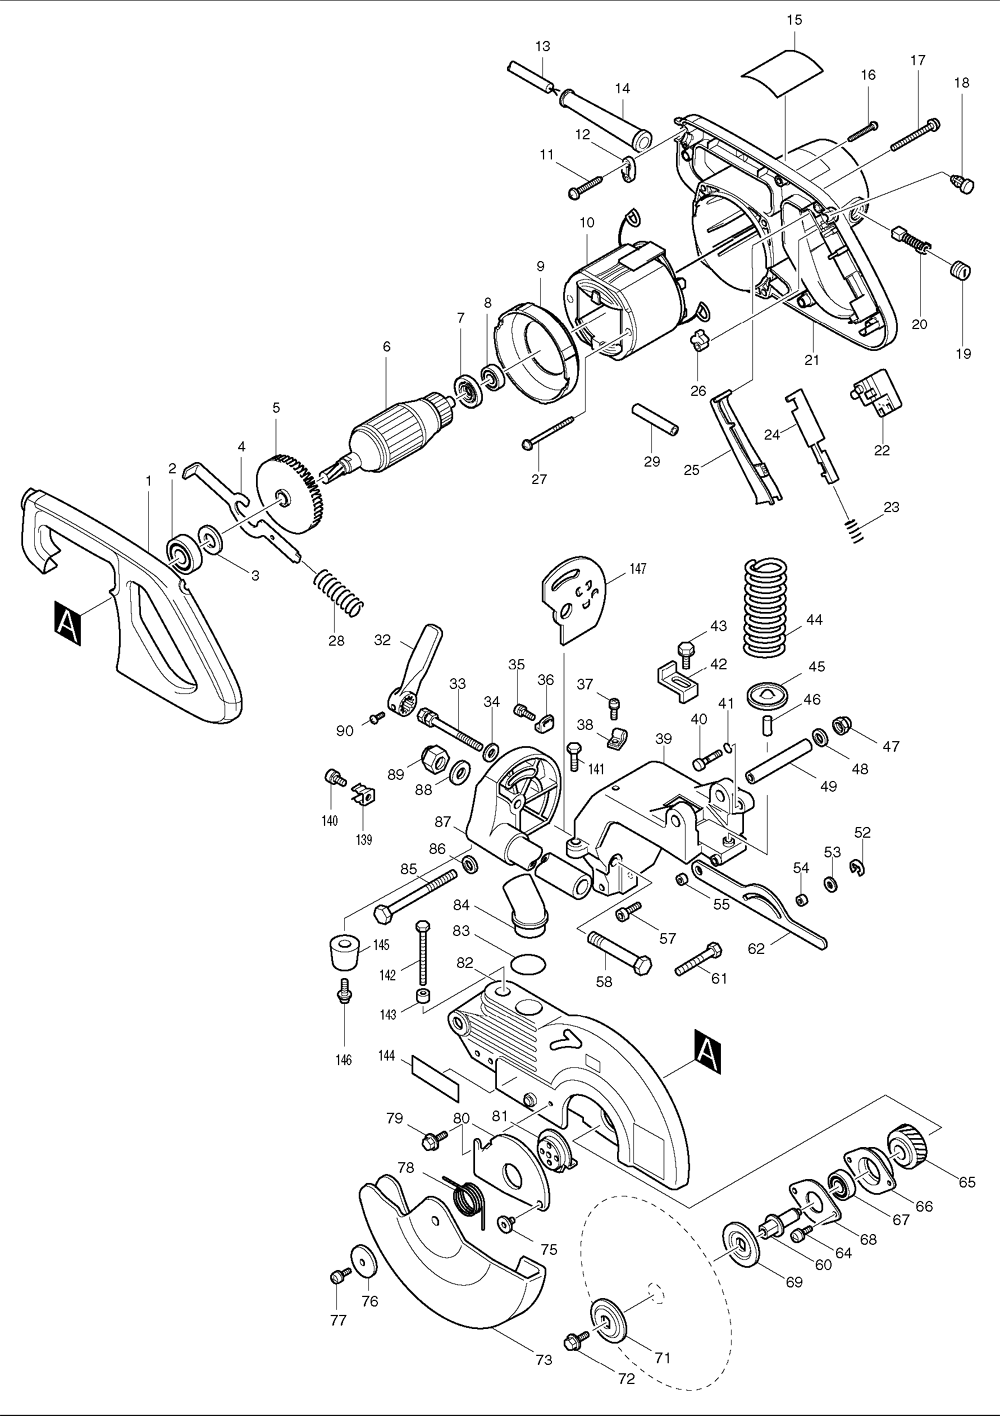 wiring diagram tool  wiring  free engine image for user